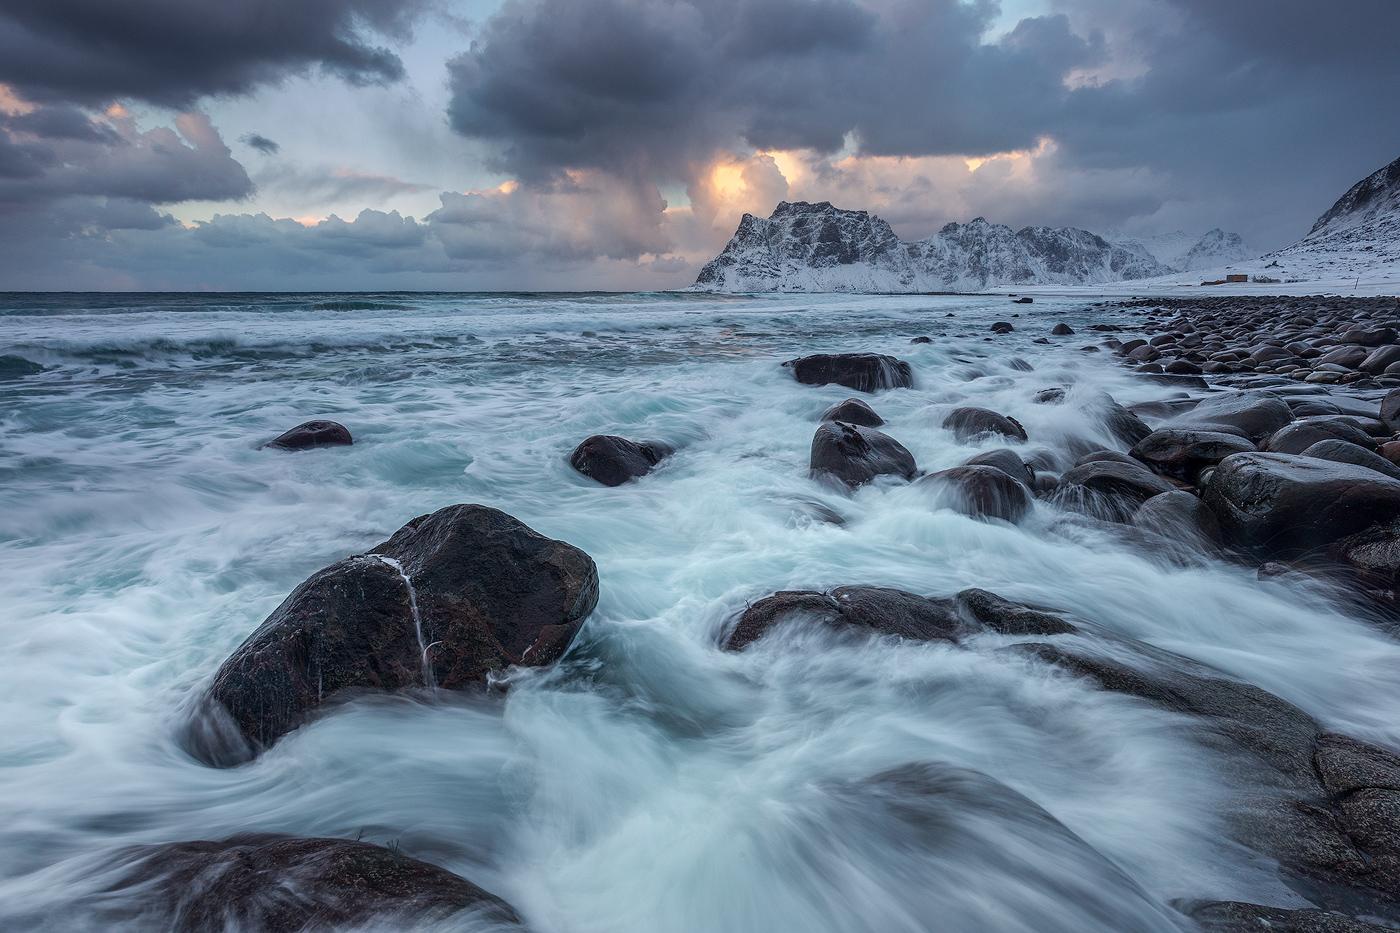 lofoten-norvege-nicolas-rottiers-photographe-caen-normandie